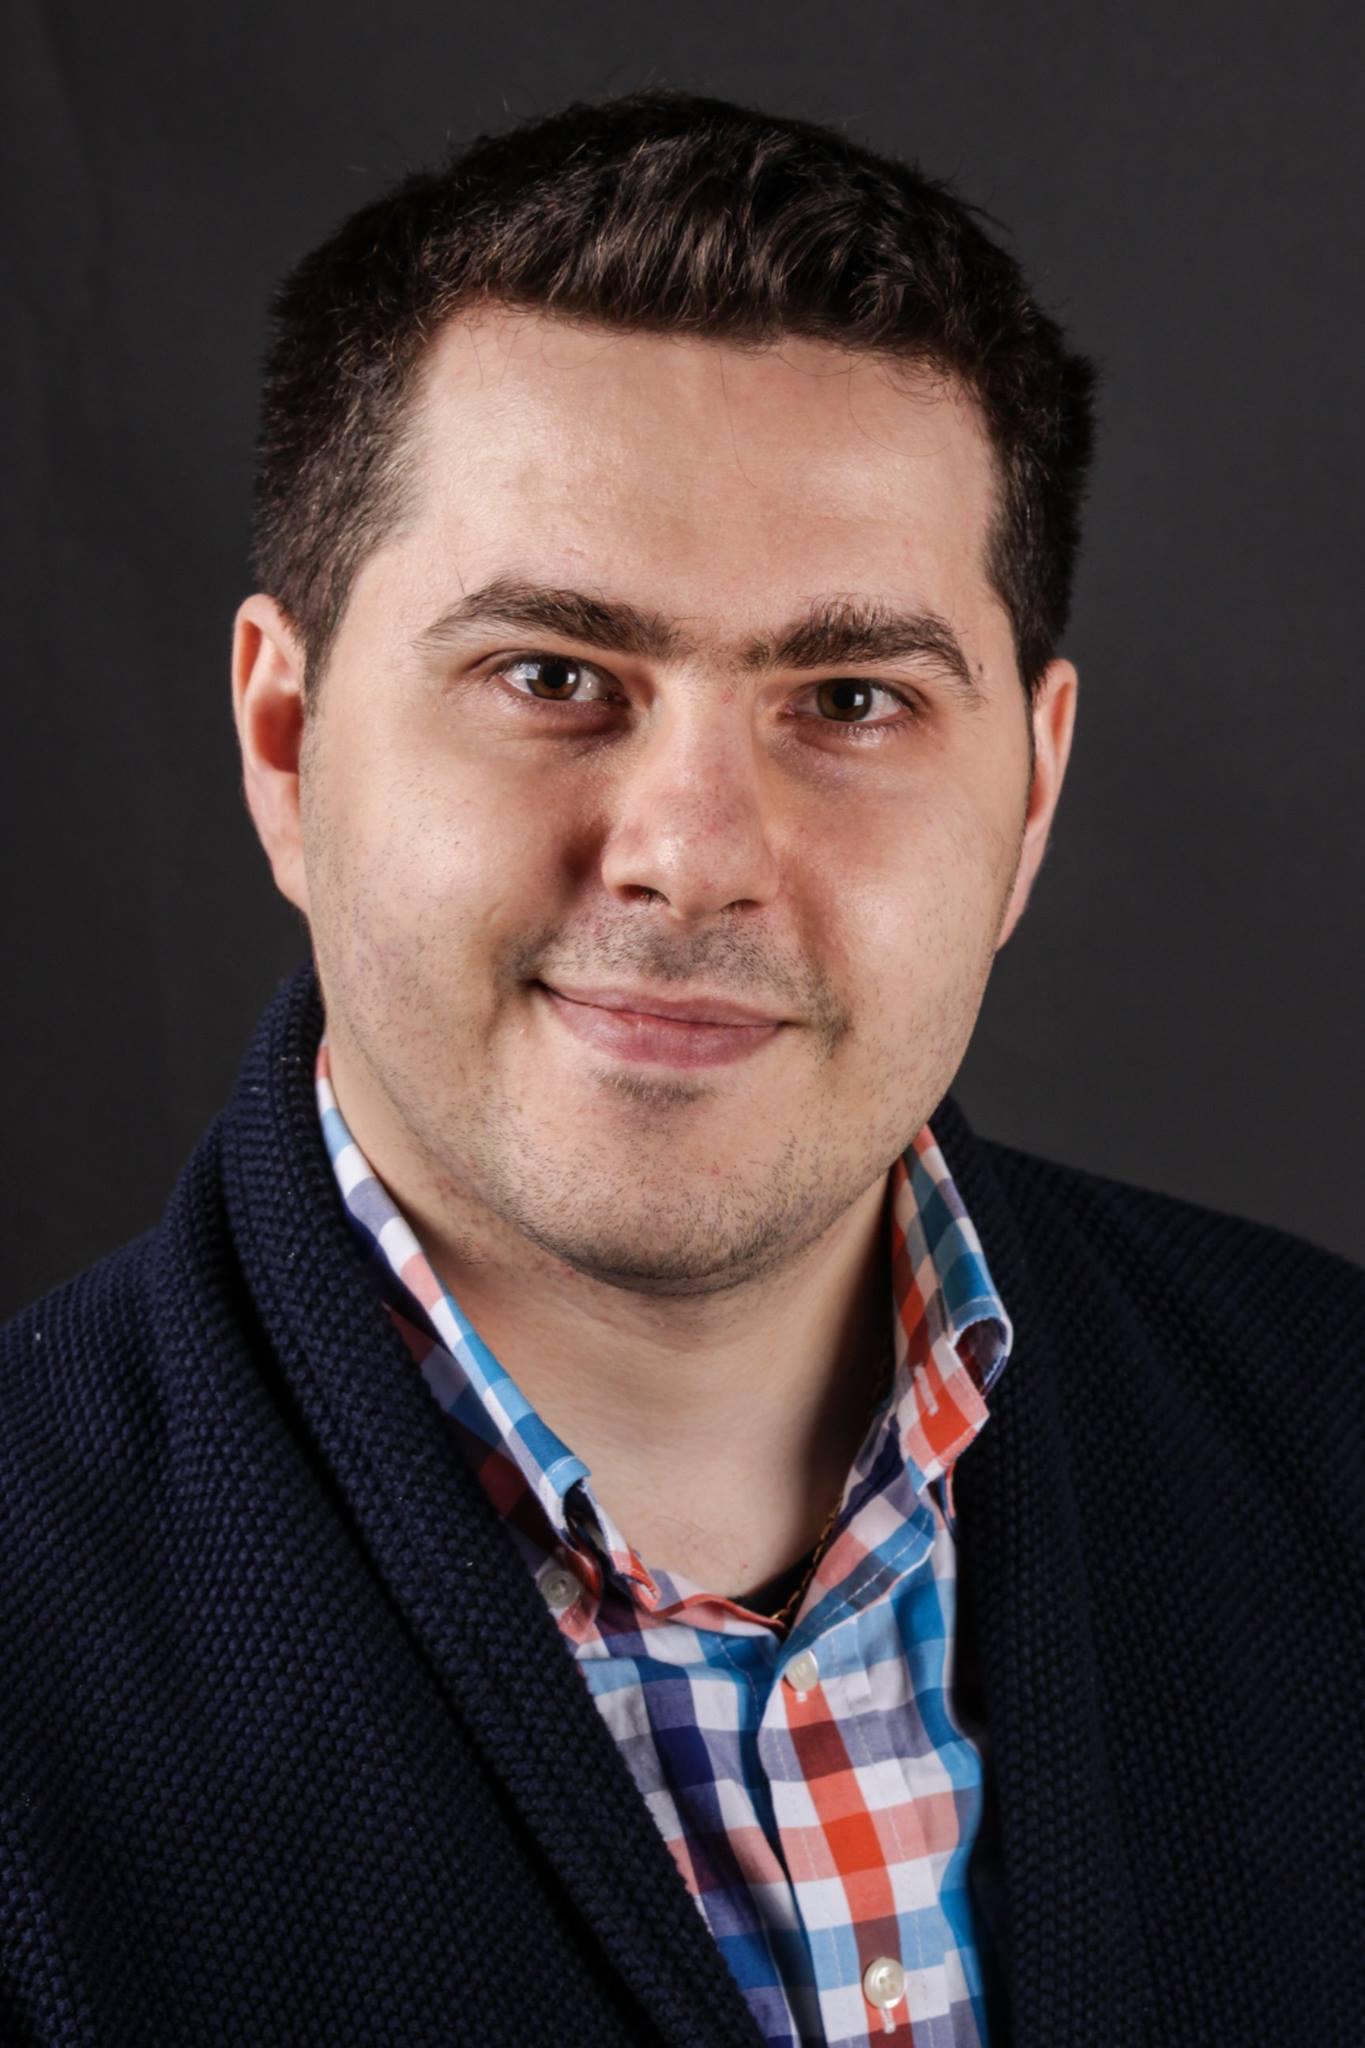 Georgi Mateev Profilbild groß